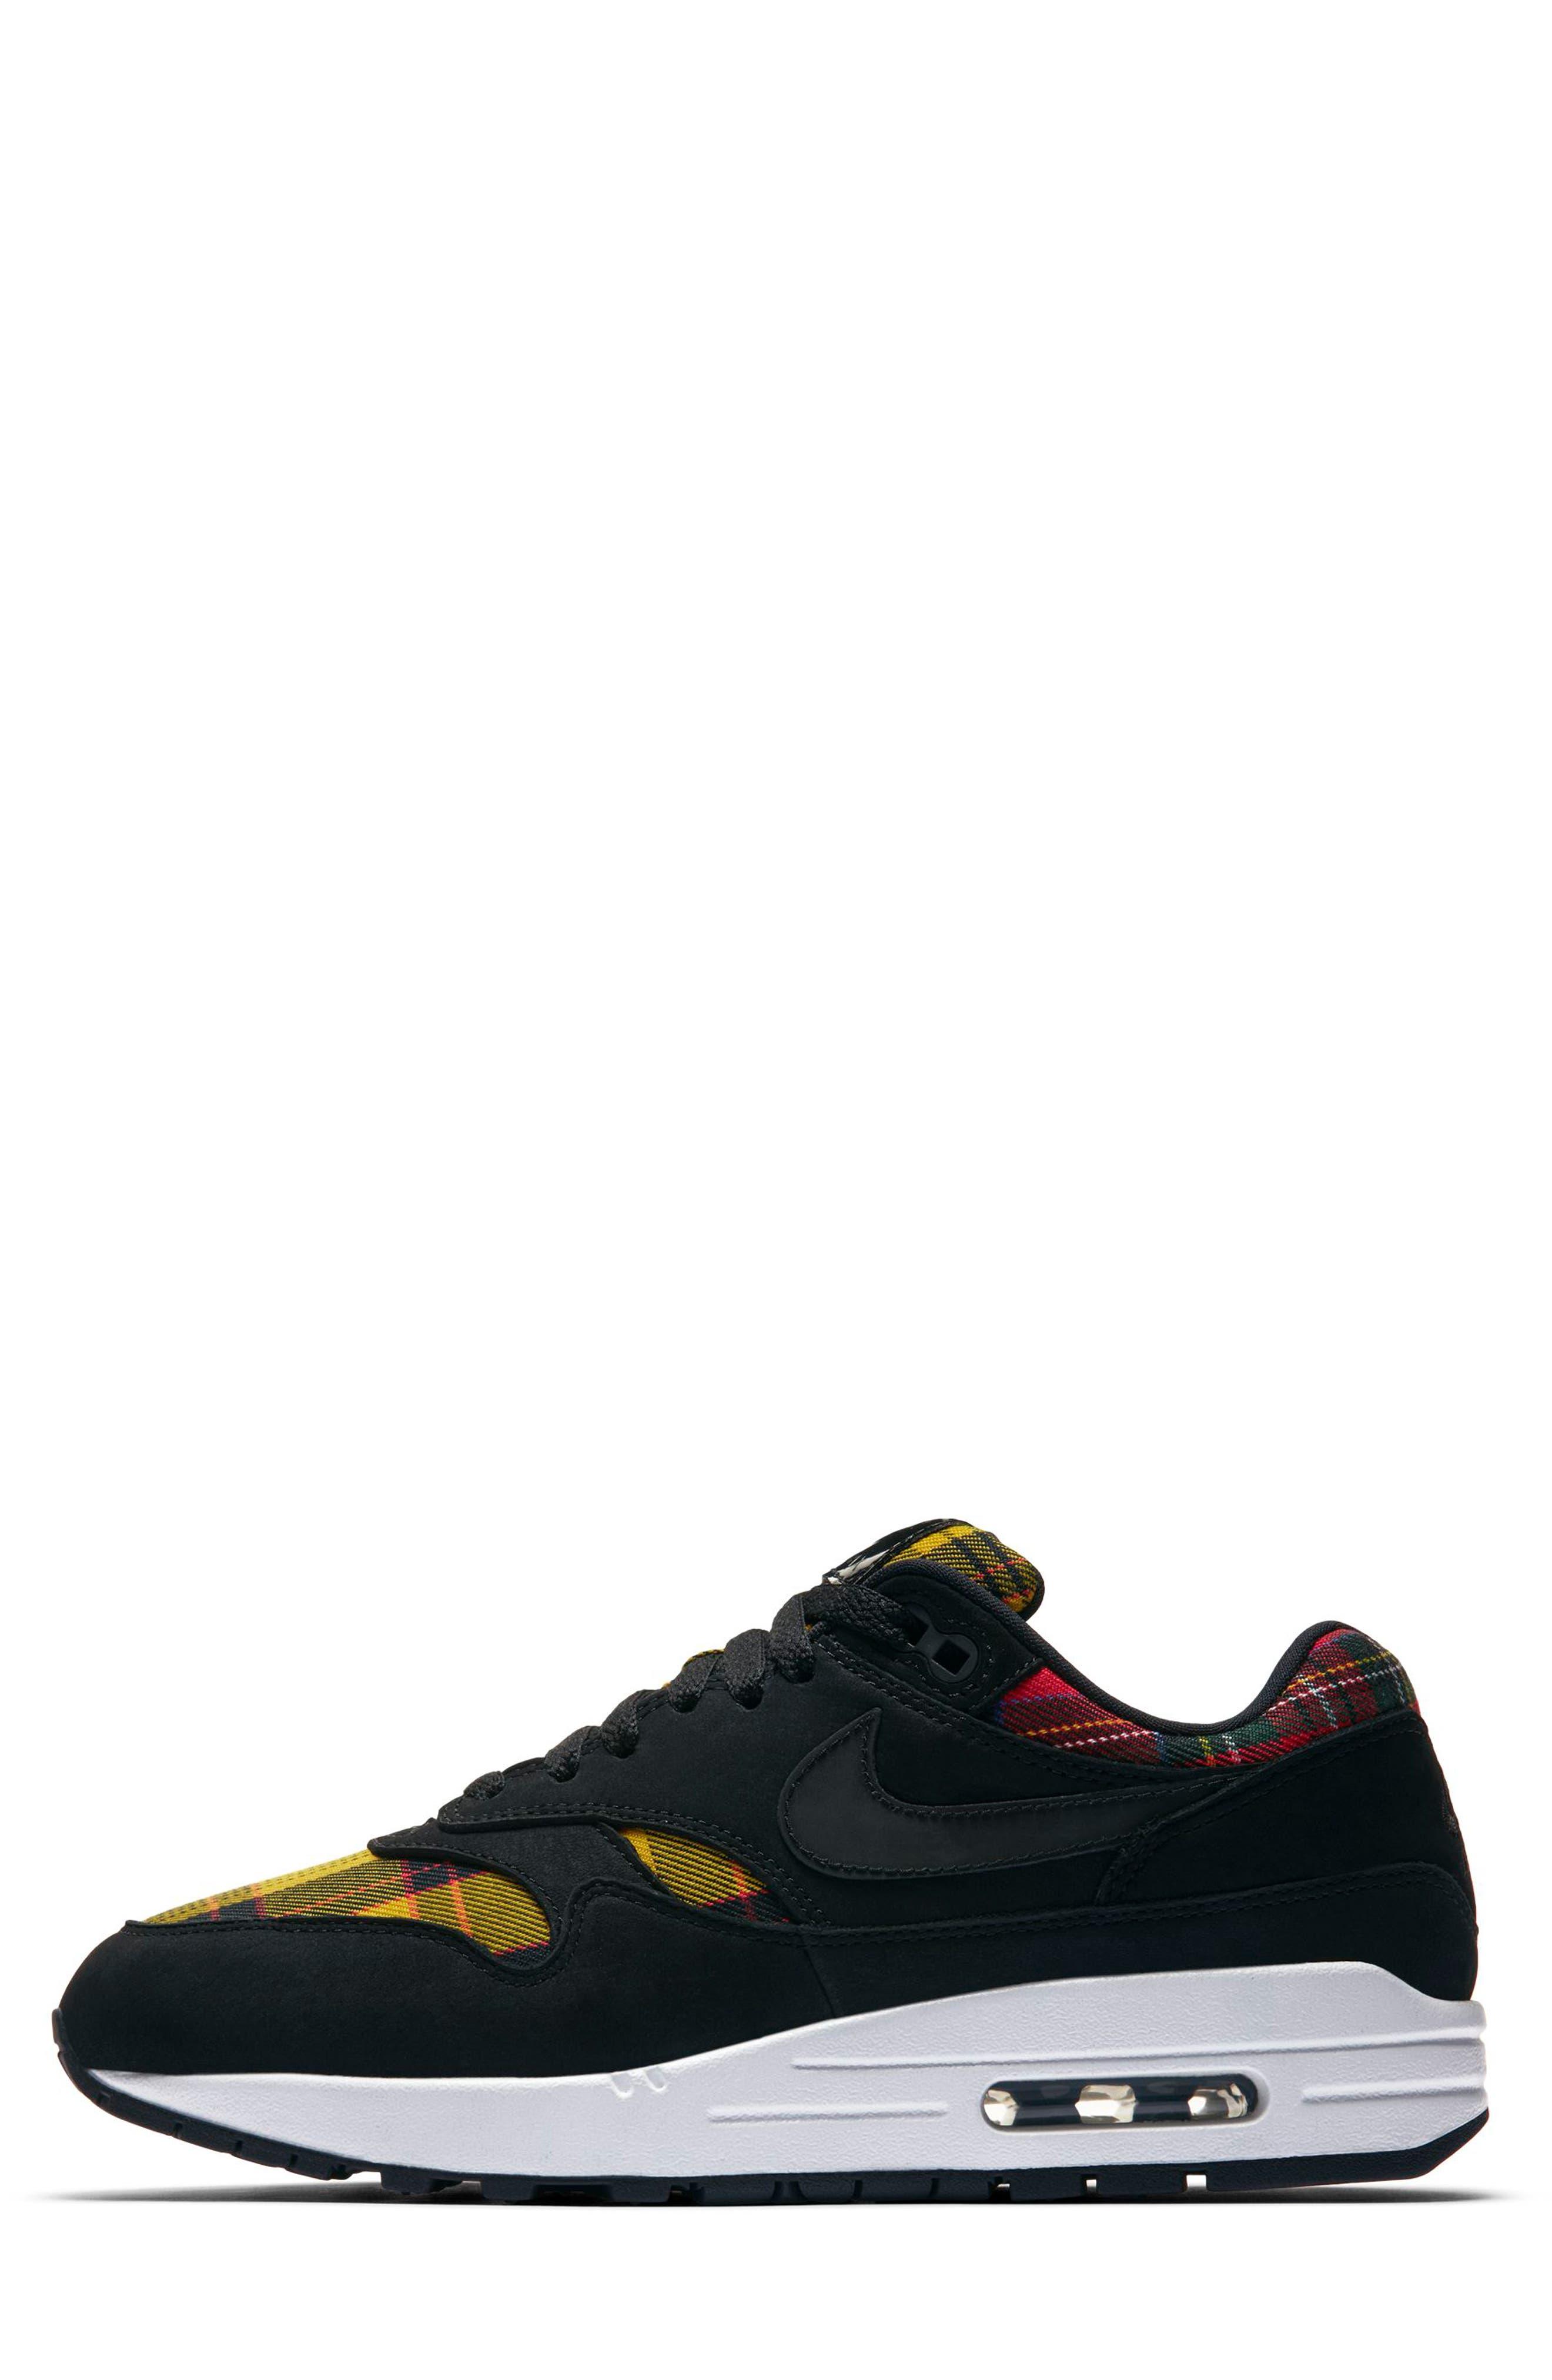 Air Max 1 SE Sneaker,                             Alternate thumbnail 3, color,                             BLACK/ BLACK/ UNIVERSITY RED